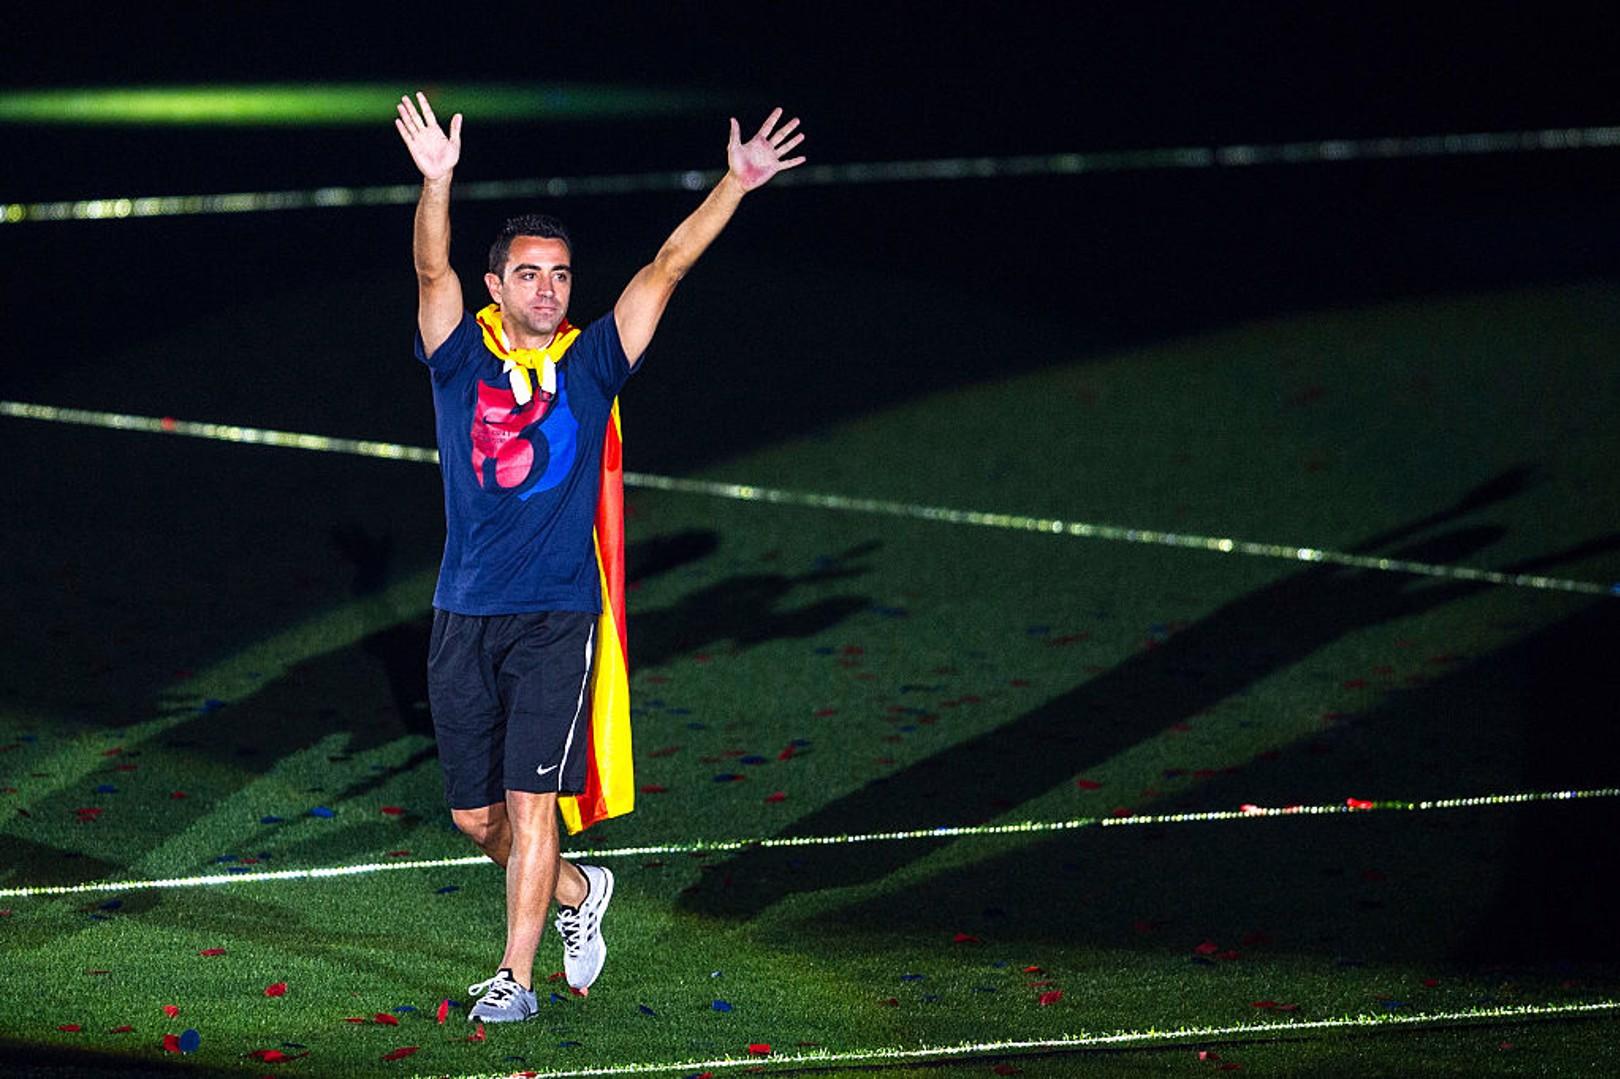 Xavi Beberkan Pengaruh Guardiola Dalam Karir Kepelatihannya